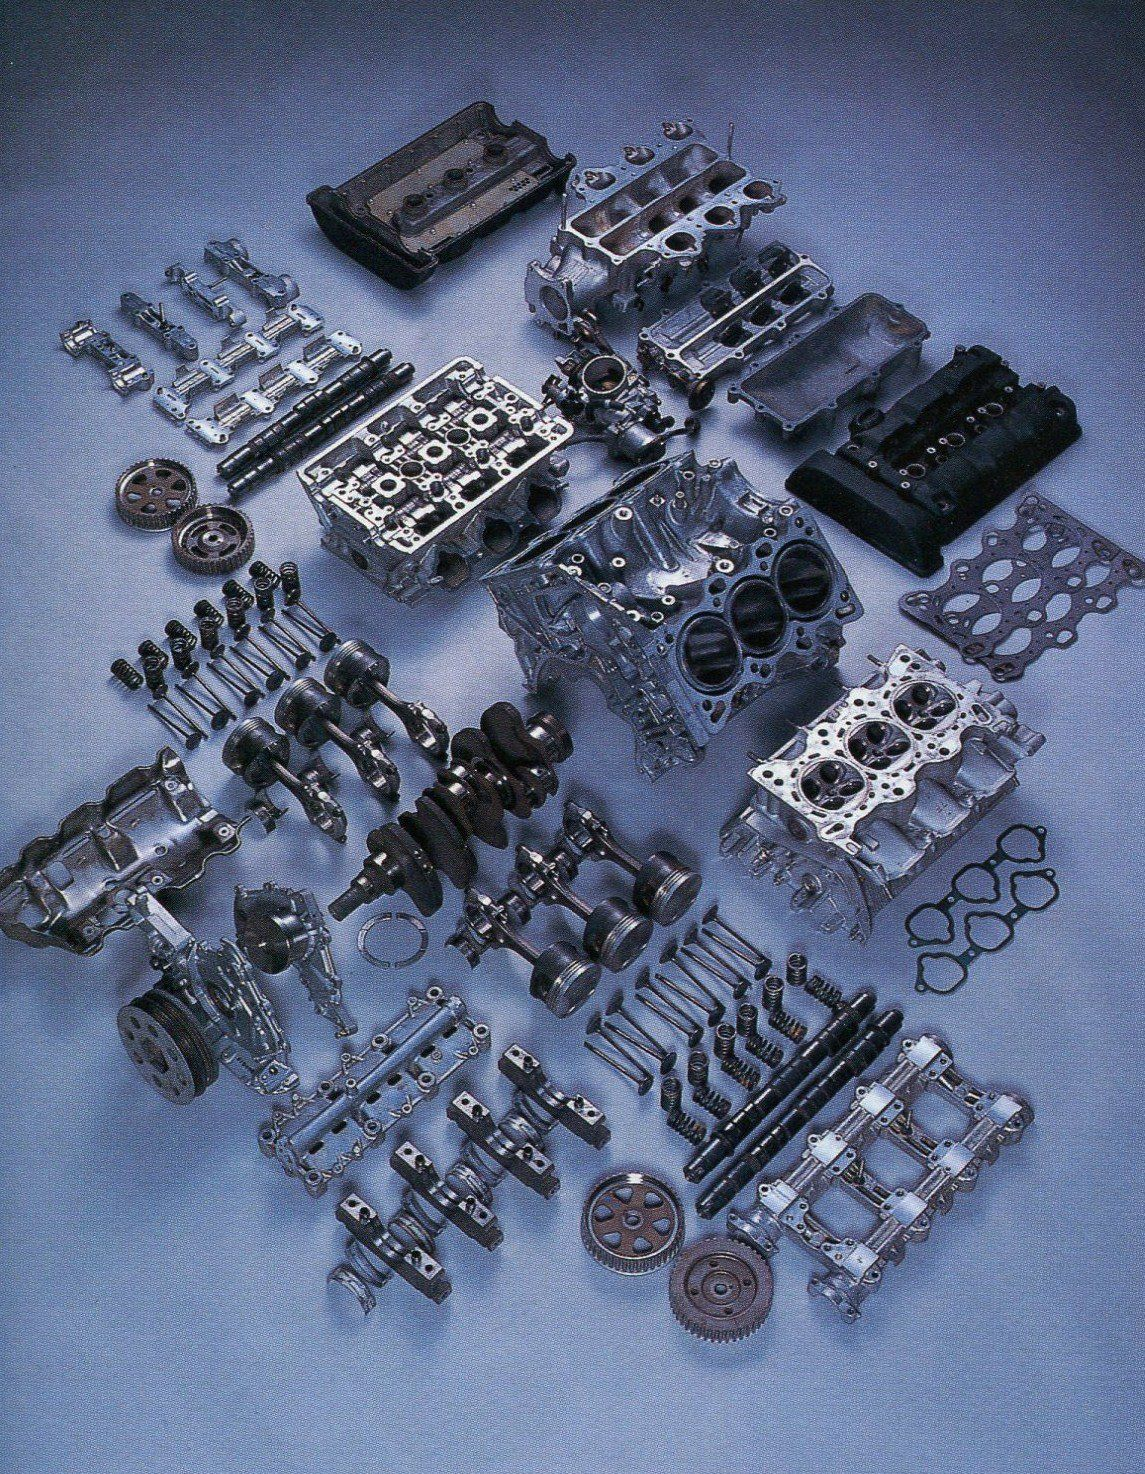 honda v engine disassembled cars honda we and we honda v6 engine disassembled